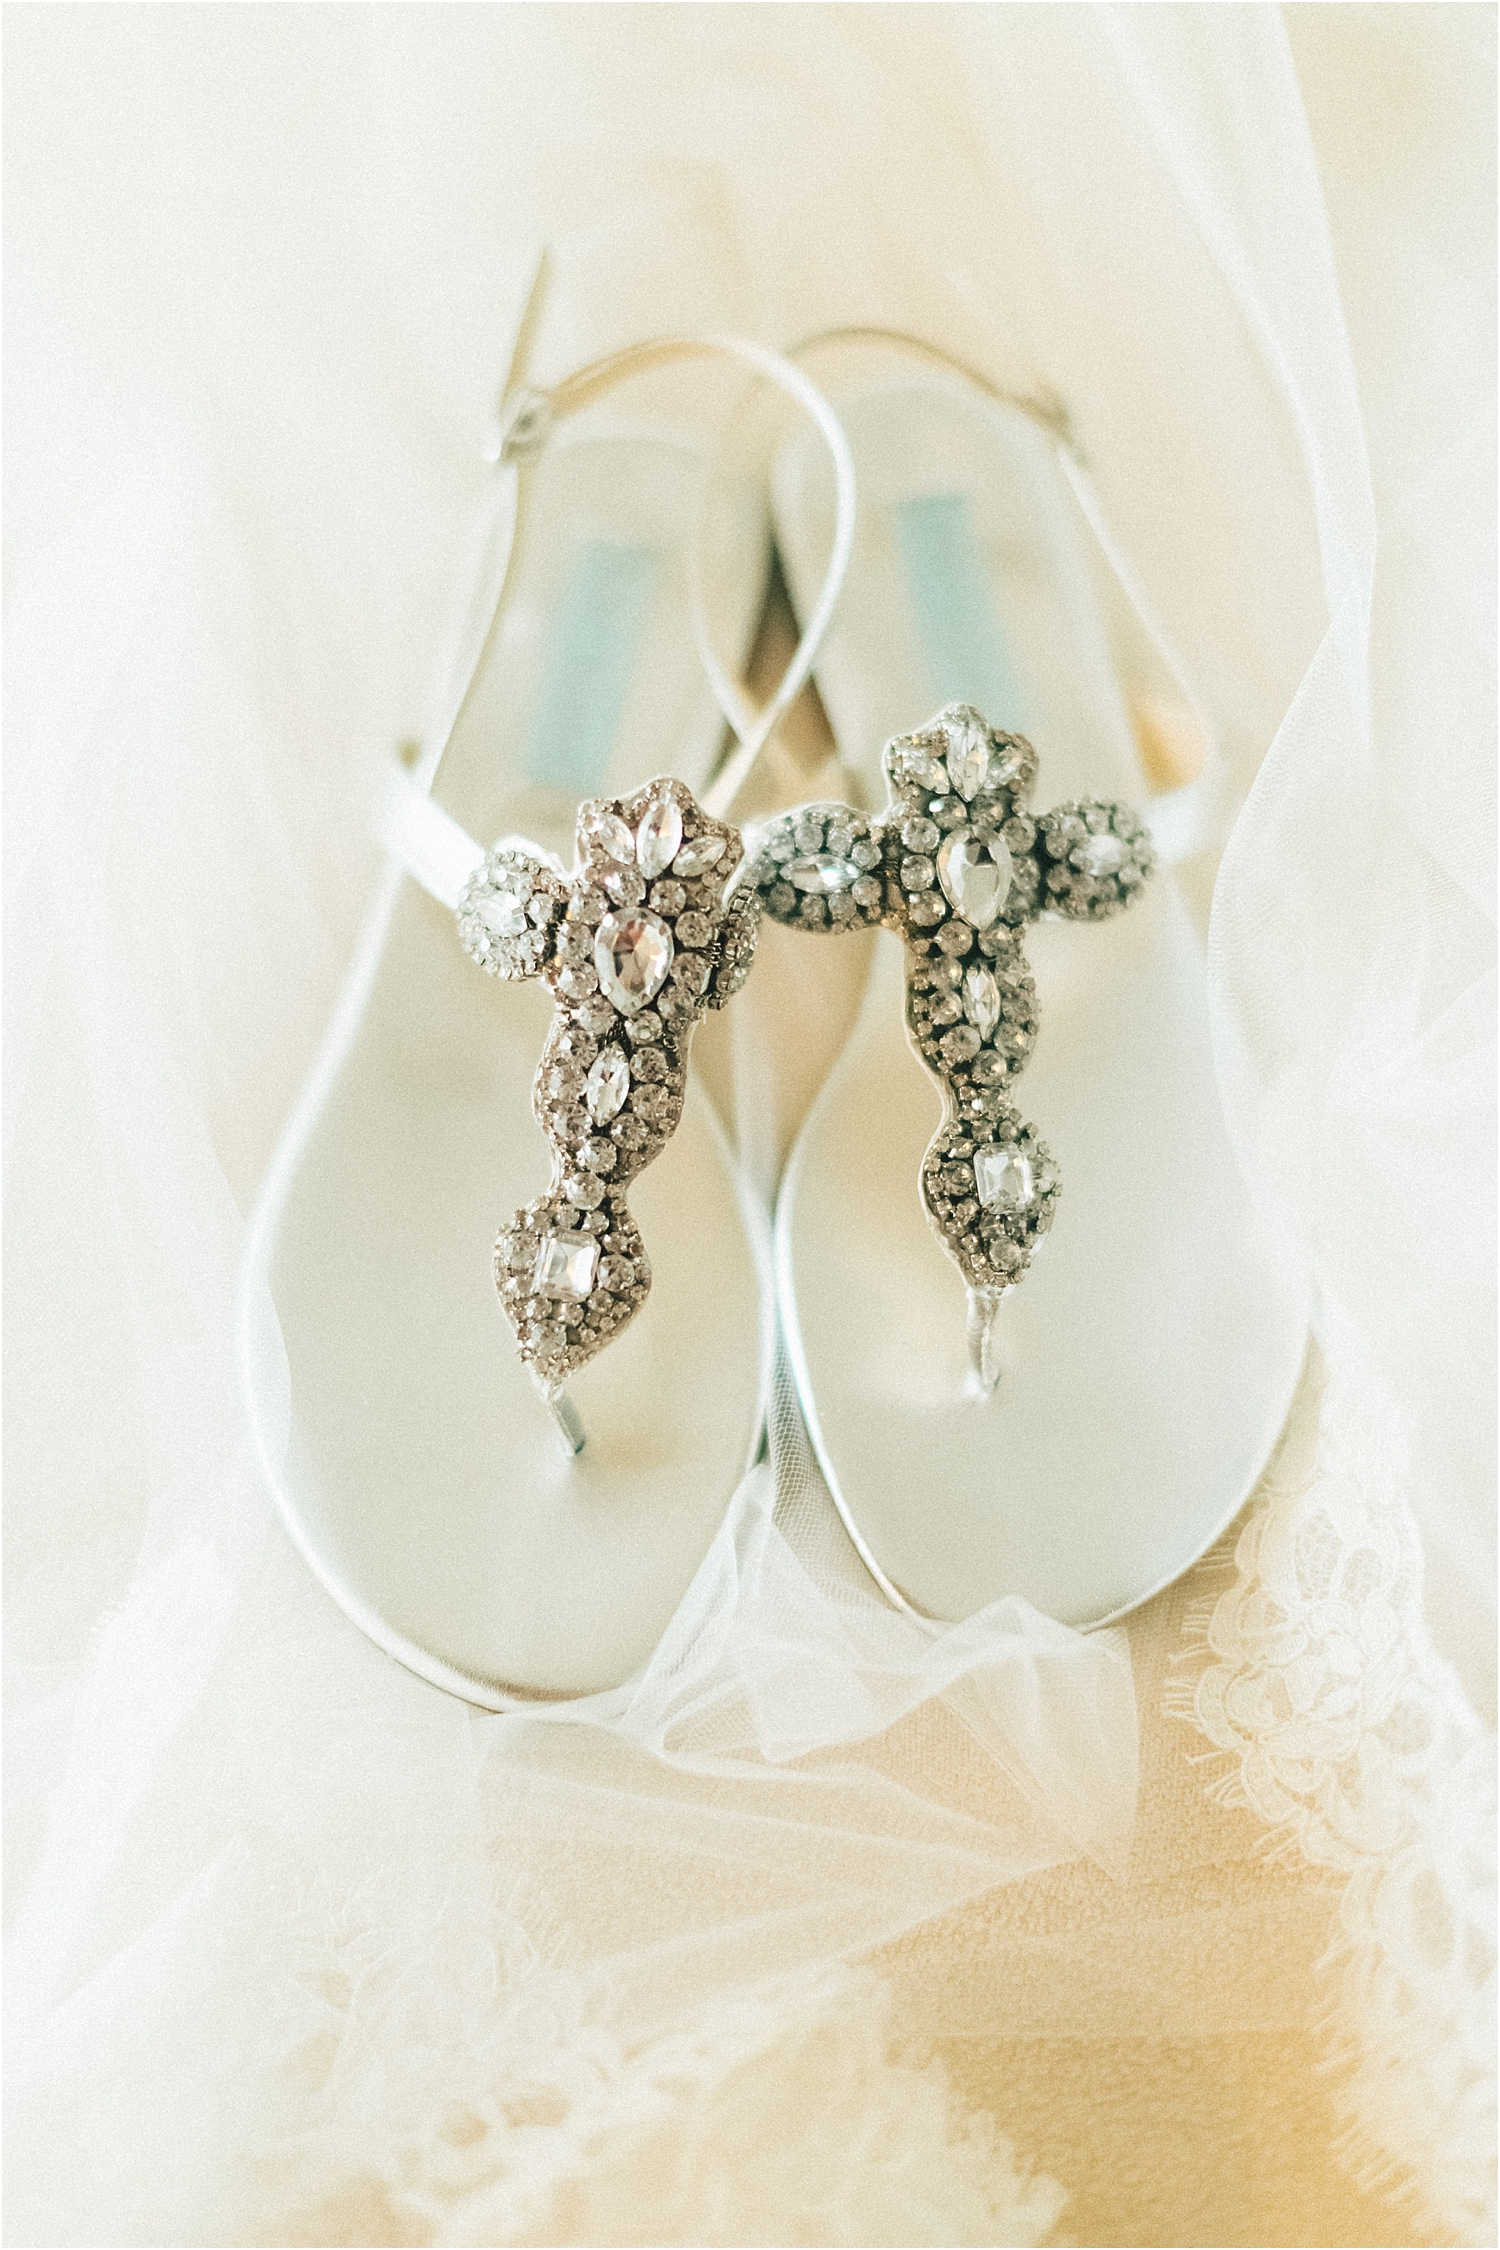 angie-diaz-photography-maui-wedding-ironwoods-beach_0015.jpg